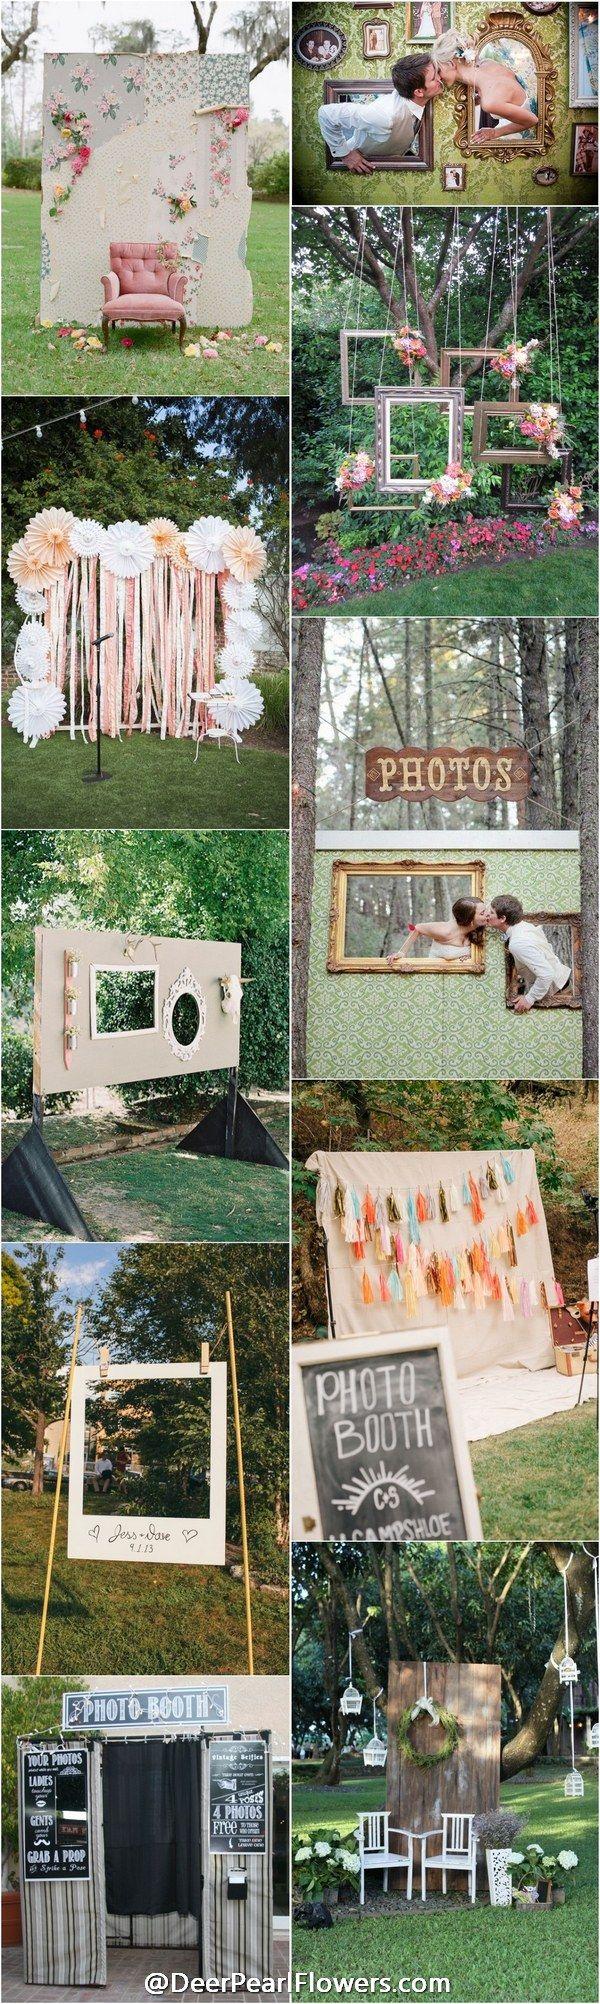 20 Brilliant Wedding Photo Booth Ideas Wedding Birthdays and